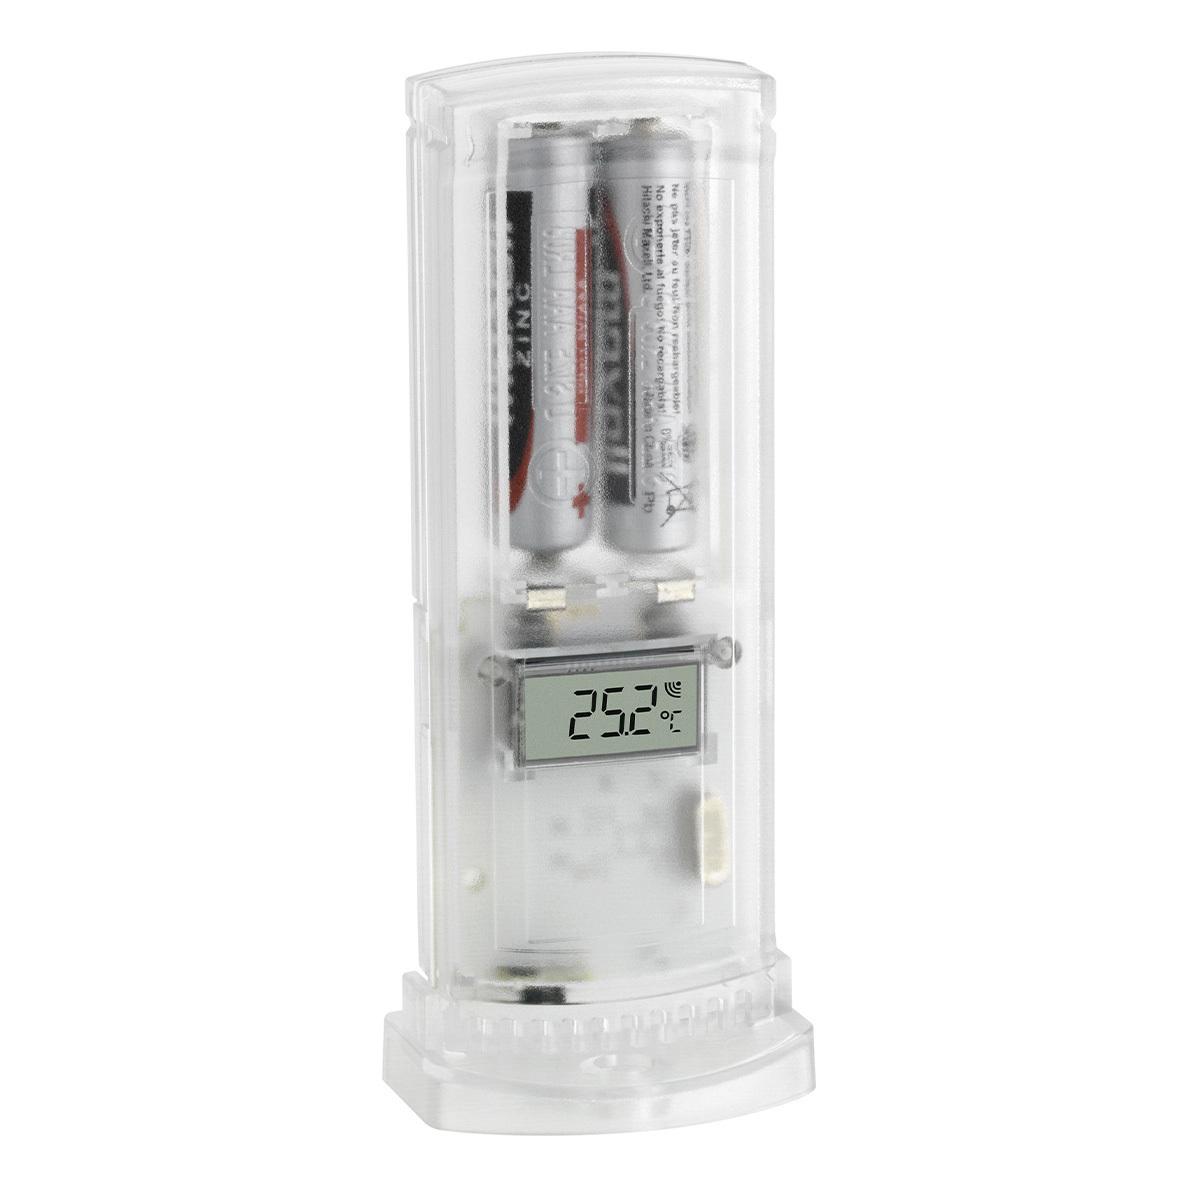 30-3187-it-thermo-hygro-sender-1200x200px.jpg